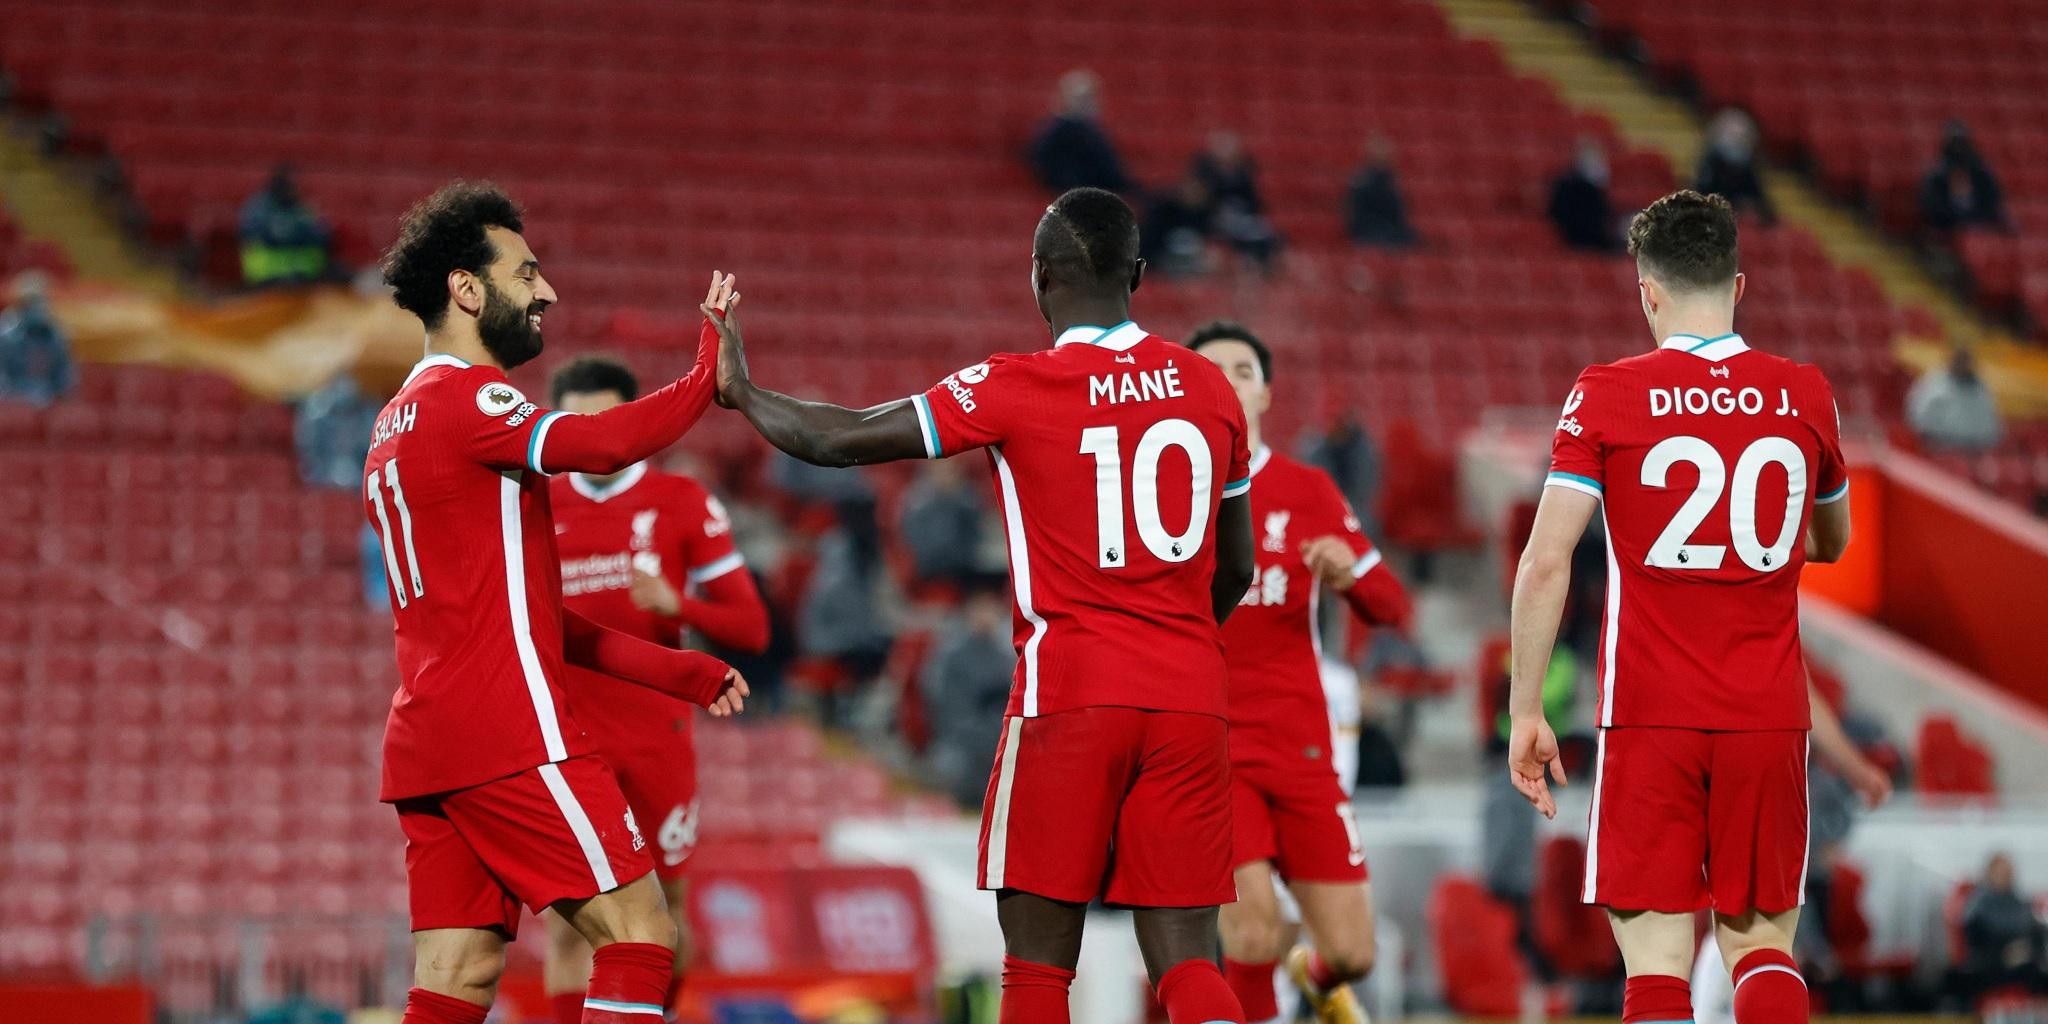 New report suggests Klopp could make huge Salah/Mane transfer gamble to fund move for Bundesliga hotshot